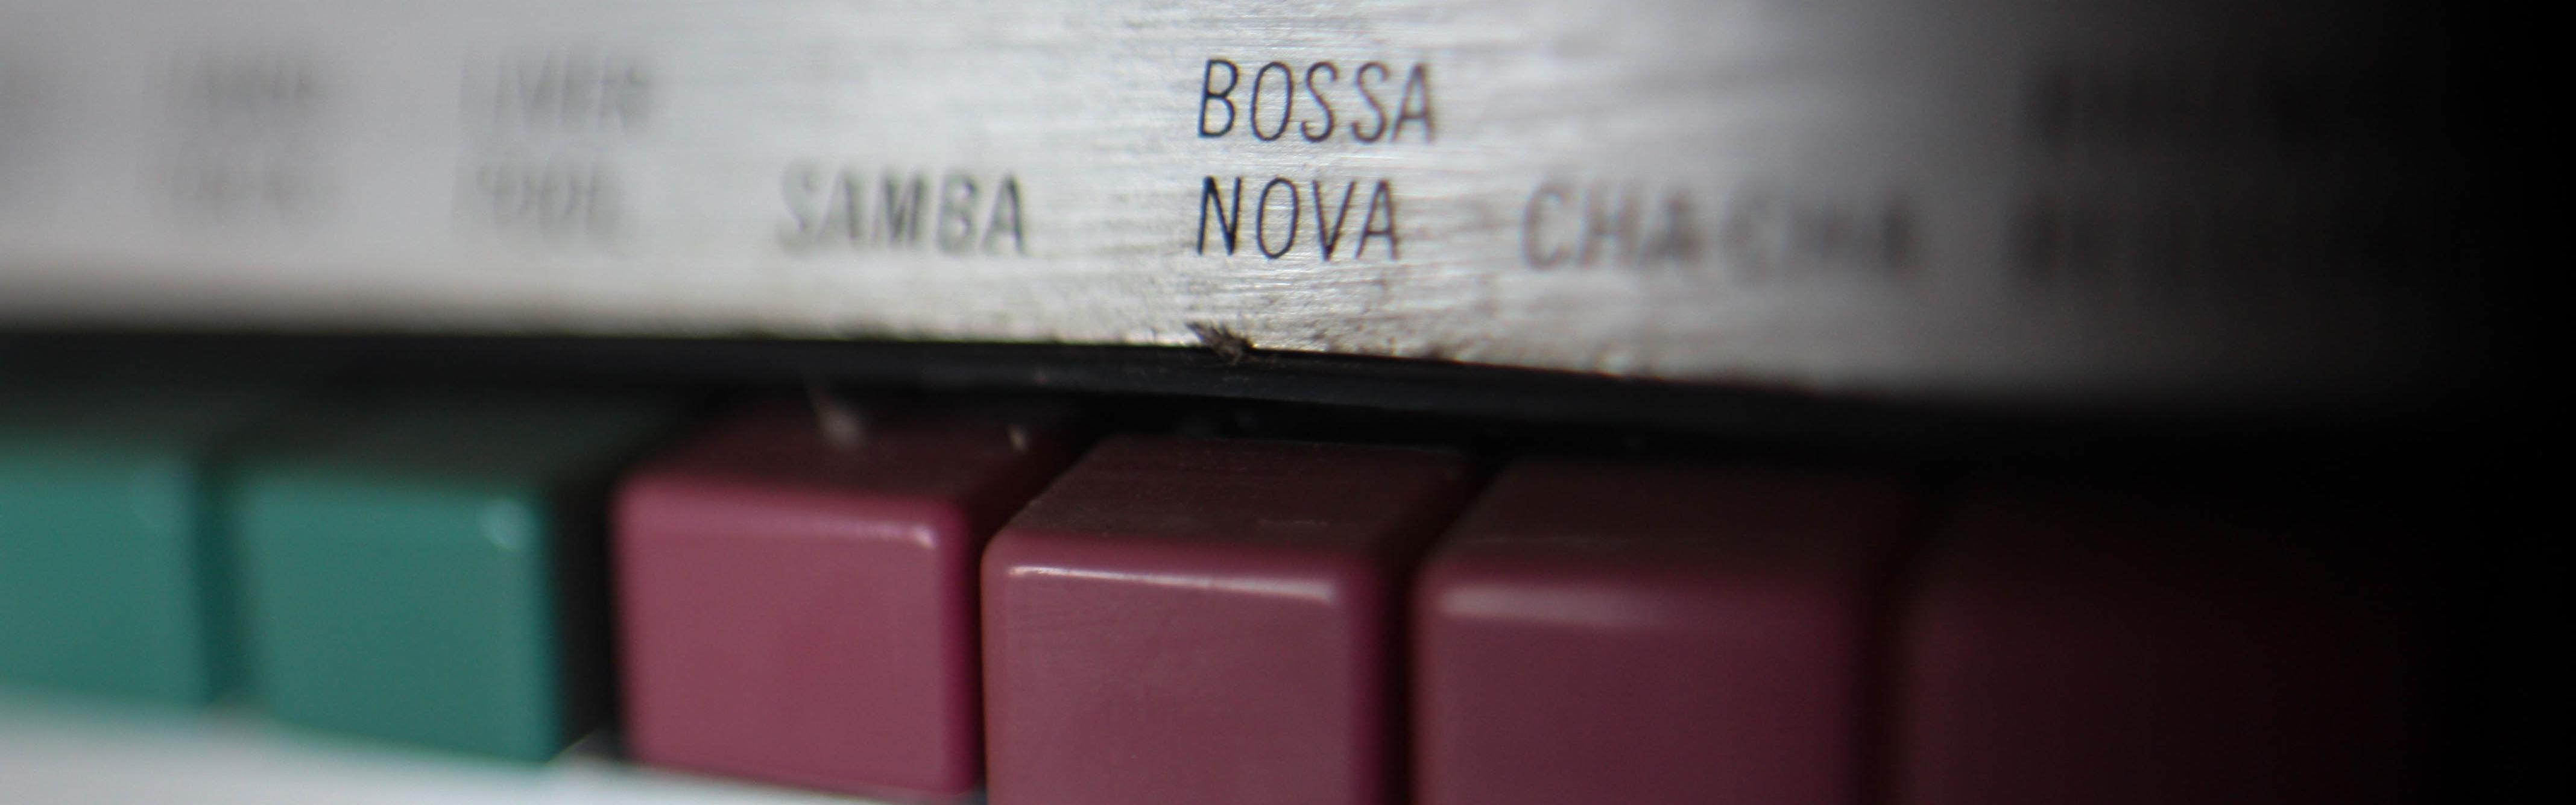 Brazil E-Commerce: Why Selling On Amazon Won't Cut It